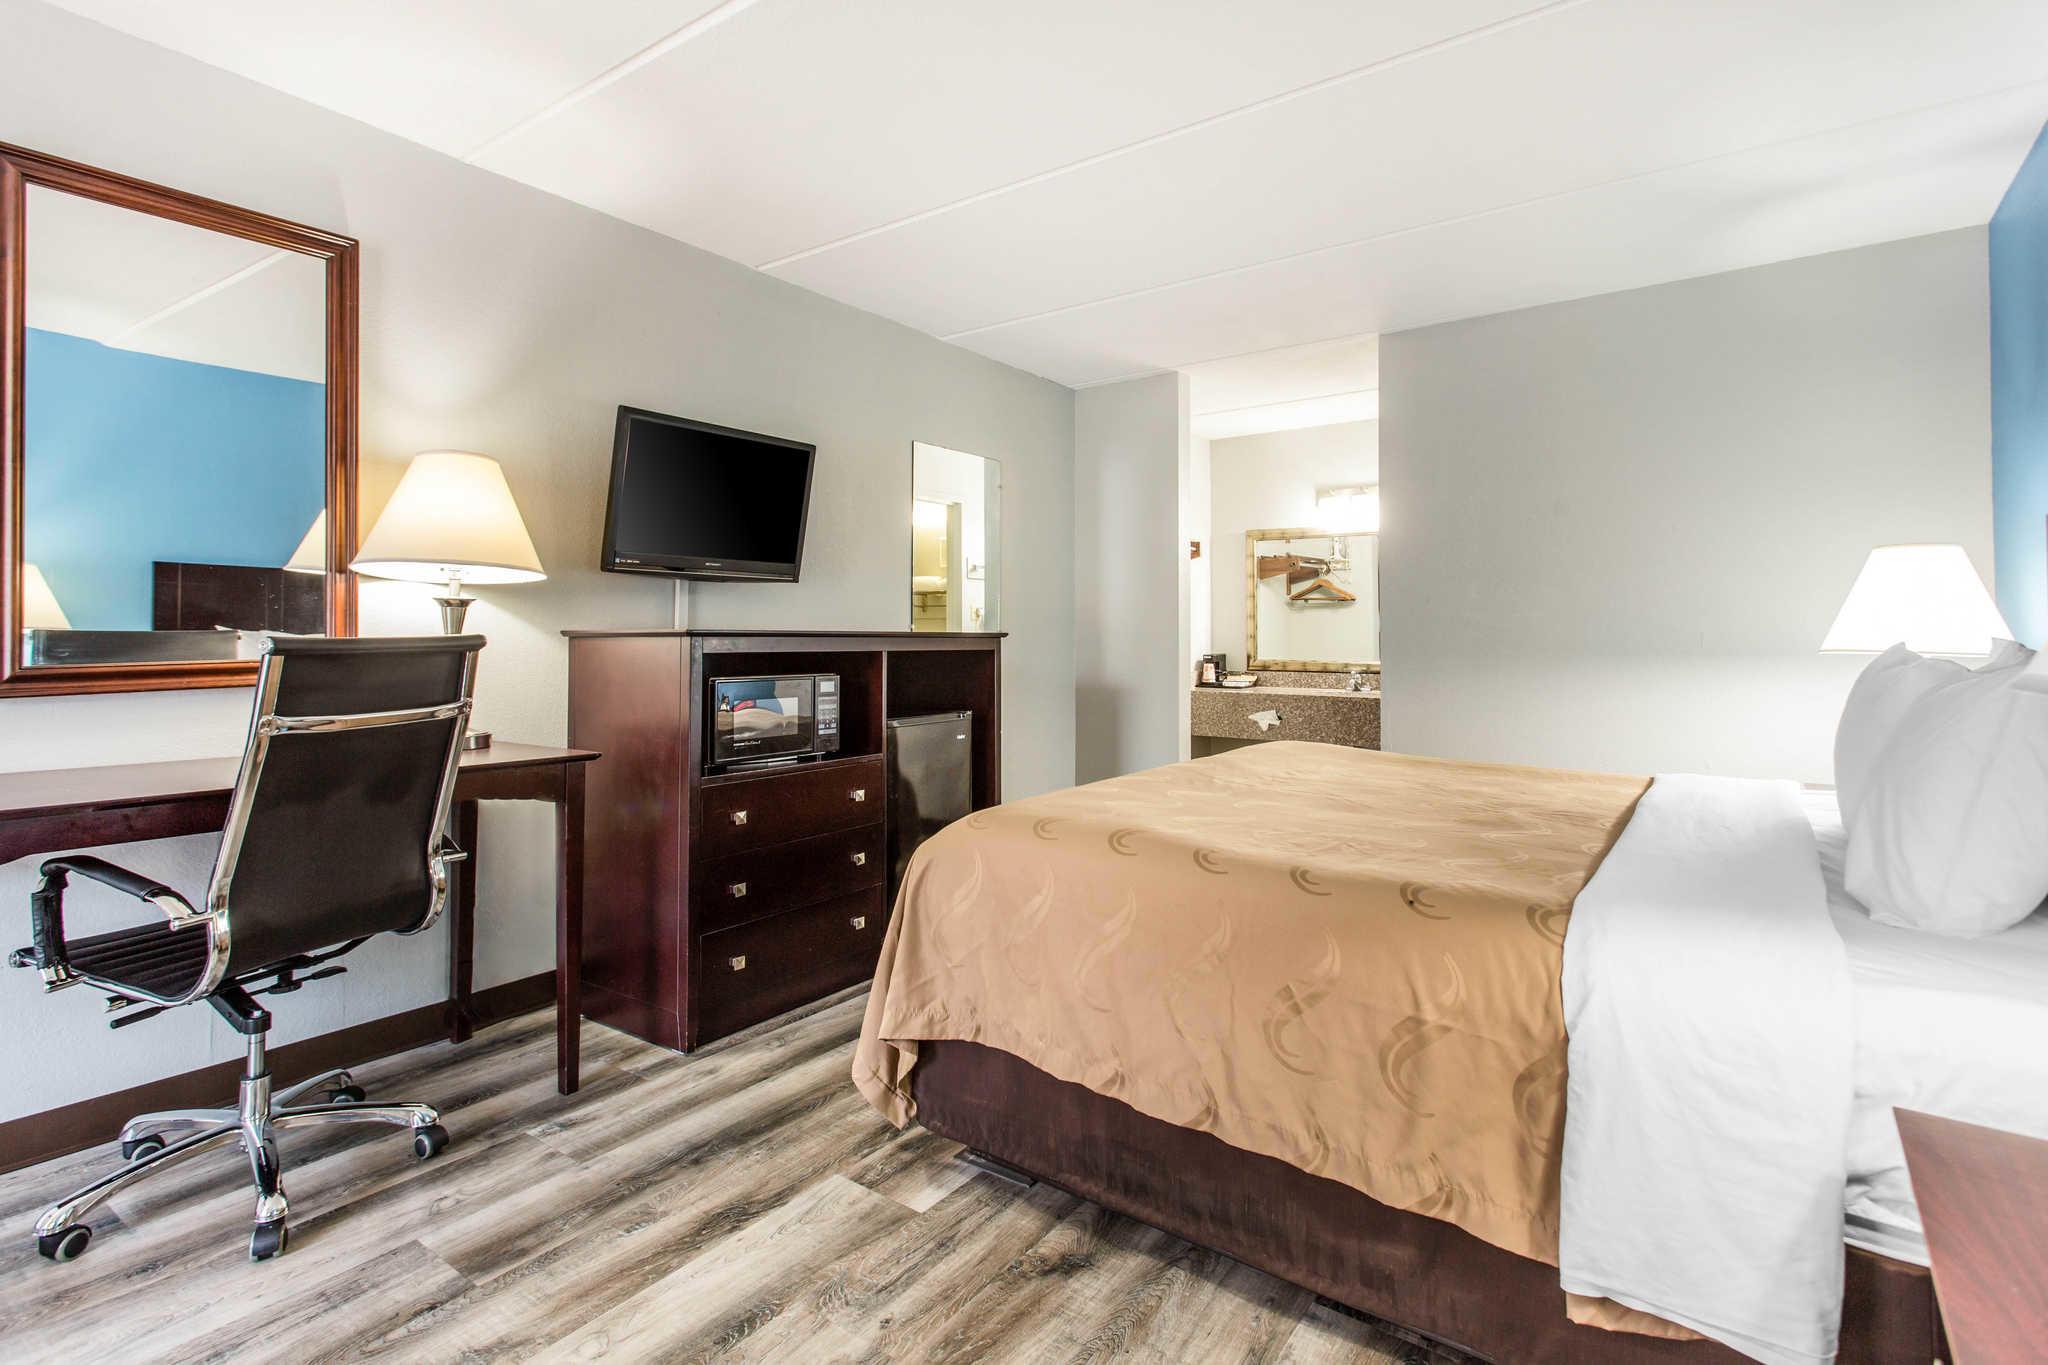 Quality Inn & Suites image 6